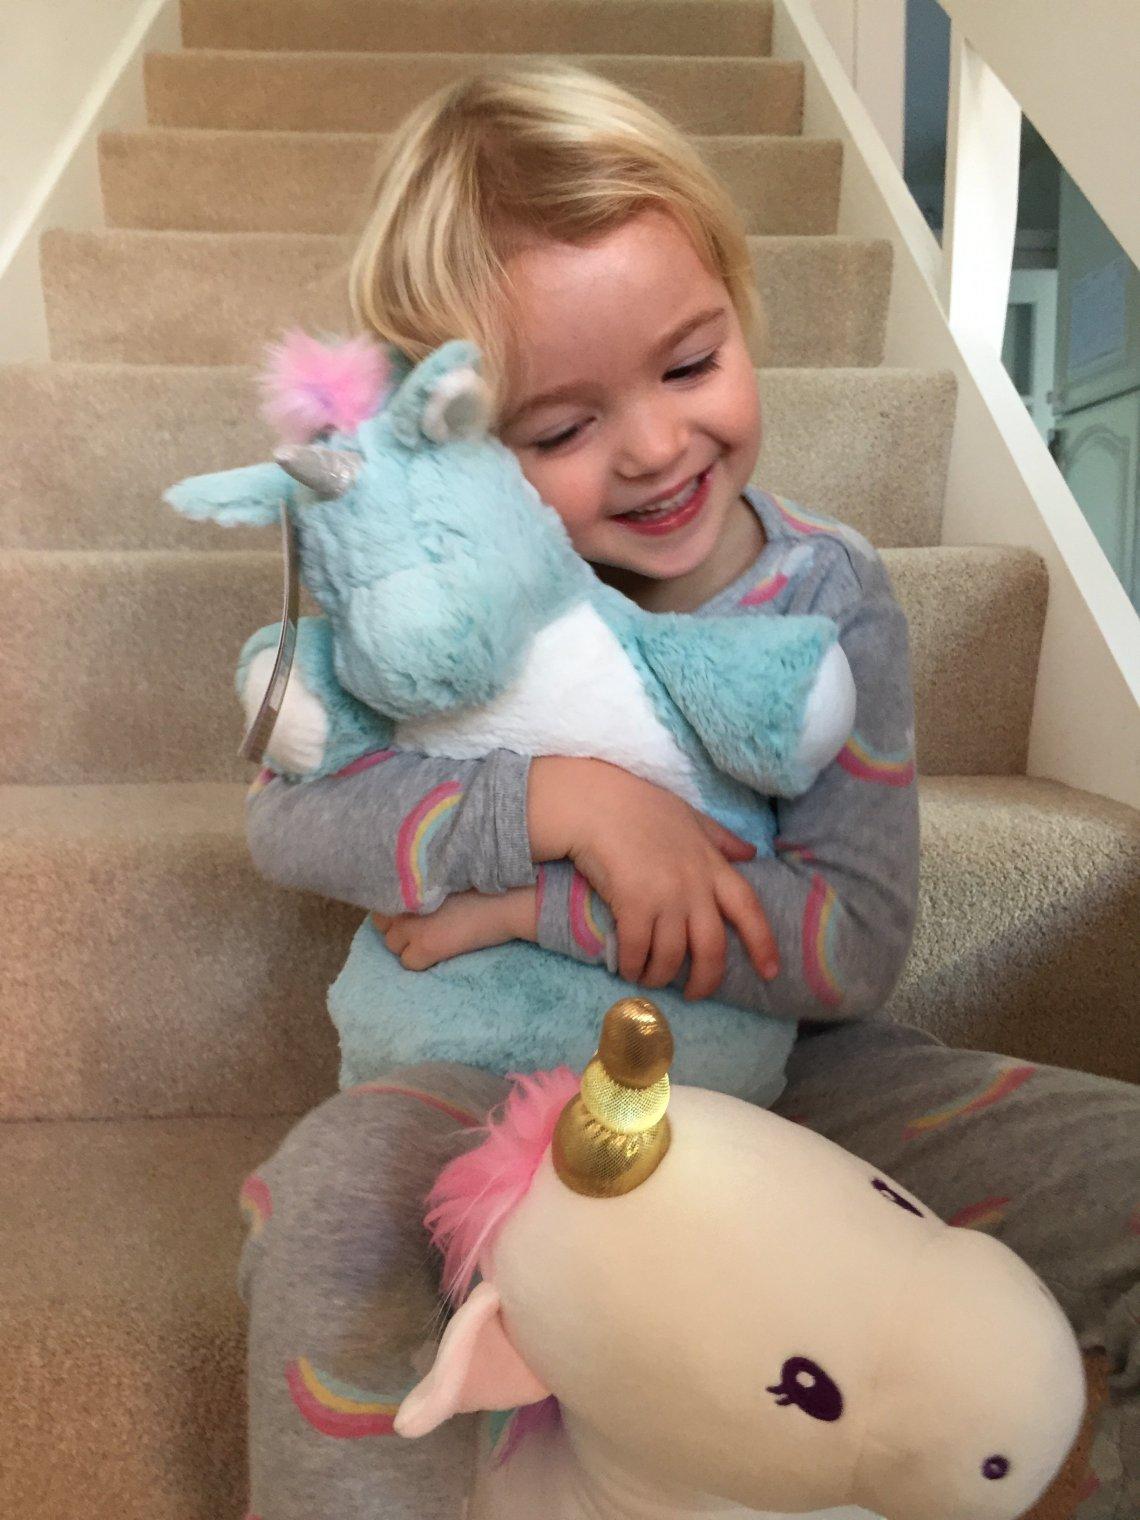 Margo hugs her favourite unicorn toy.